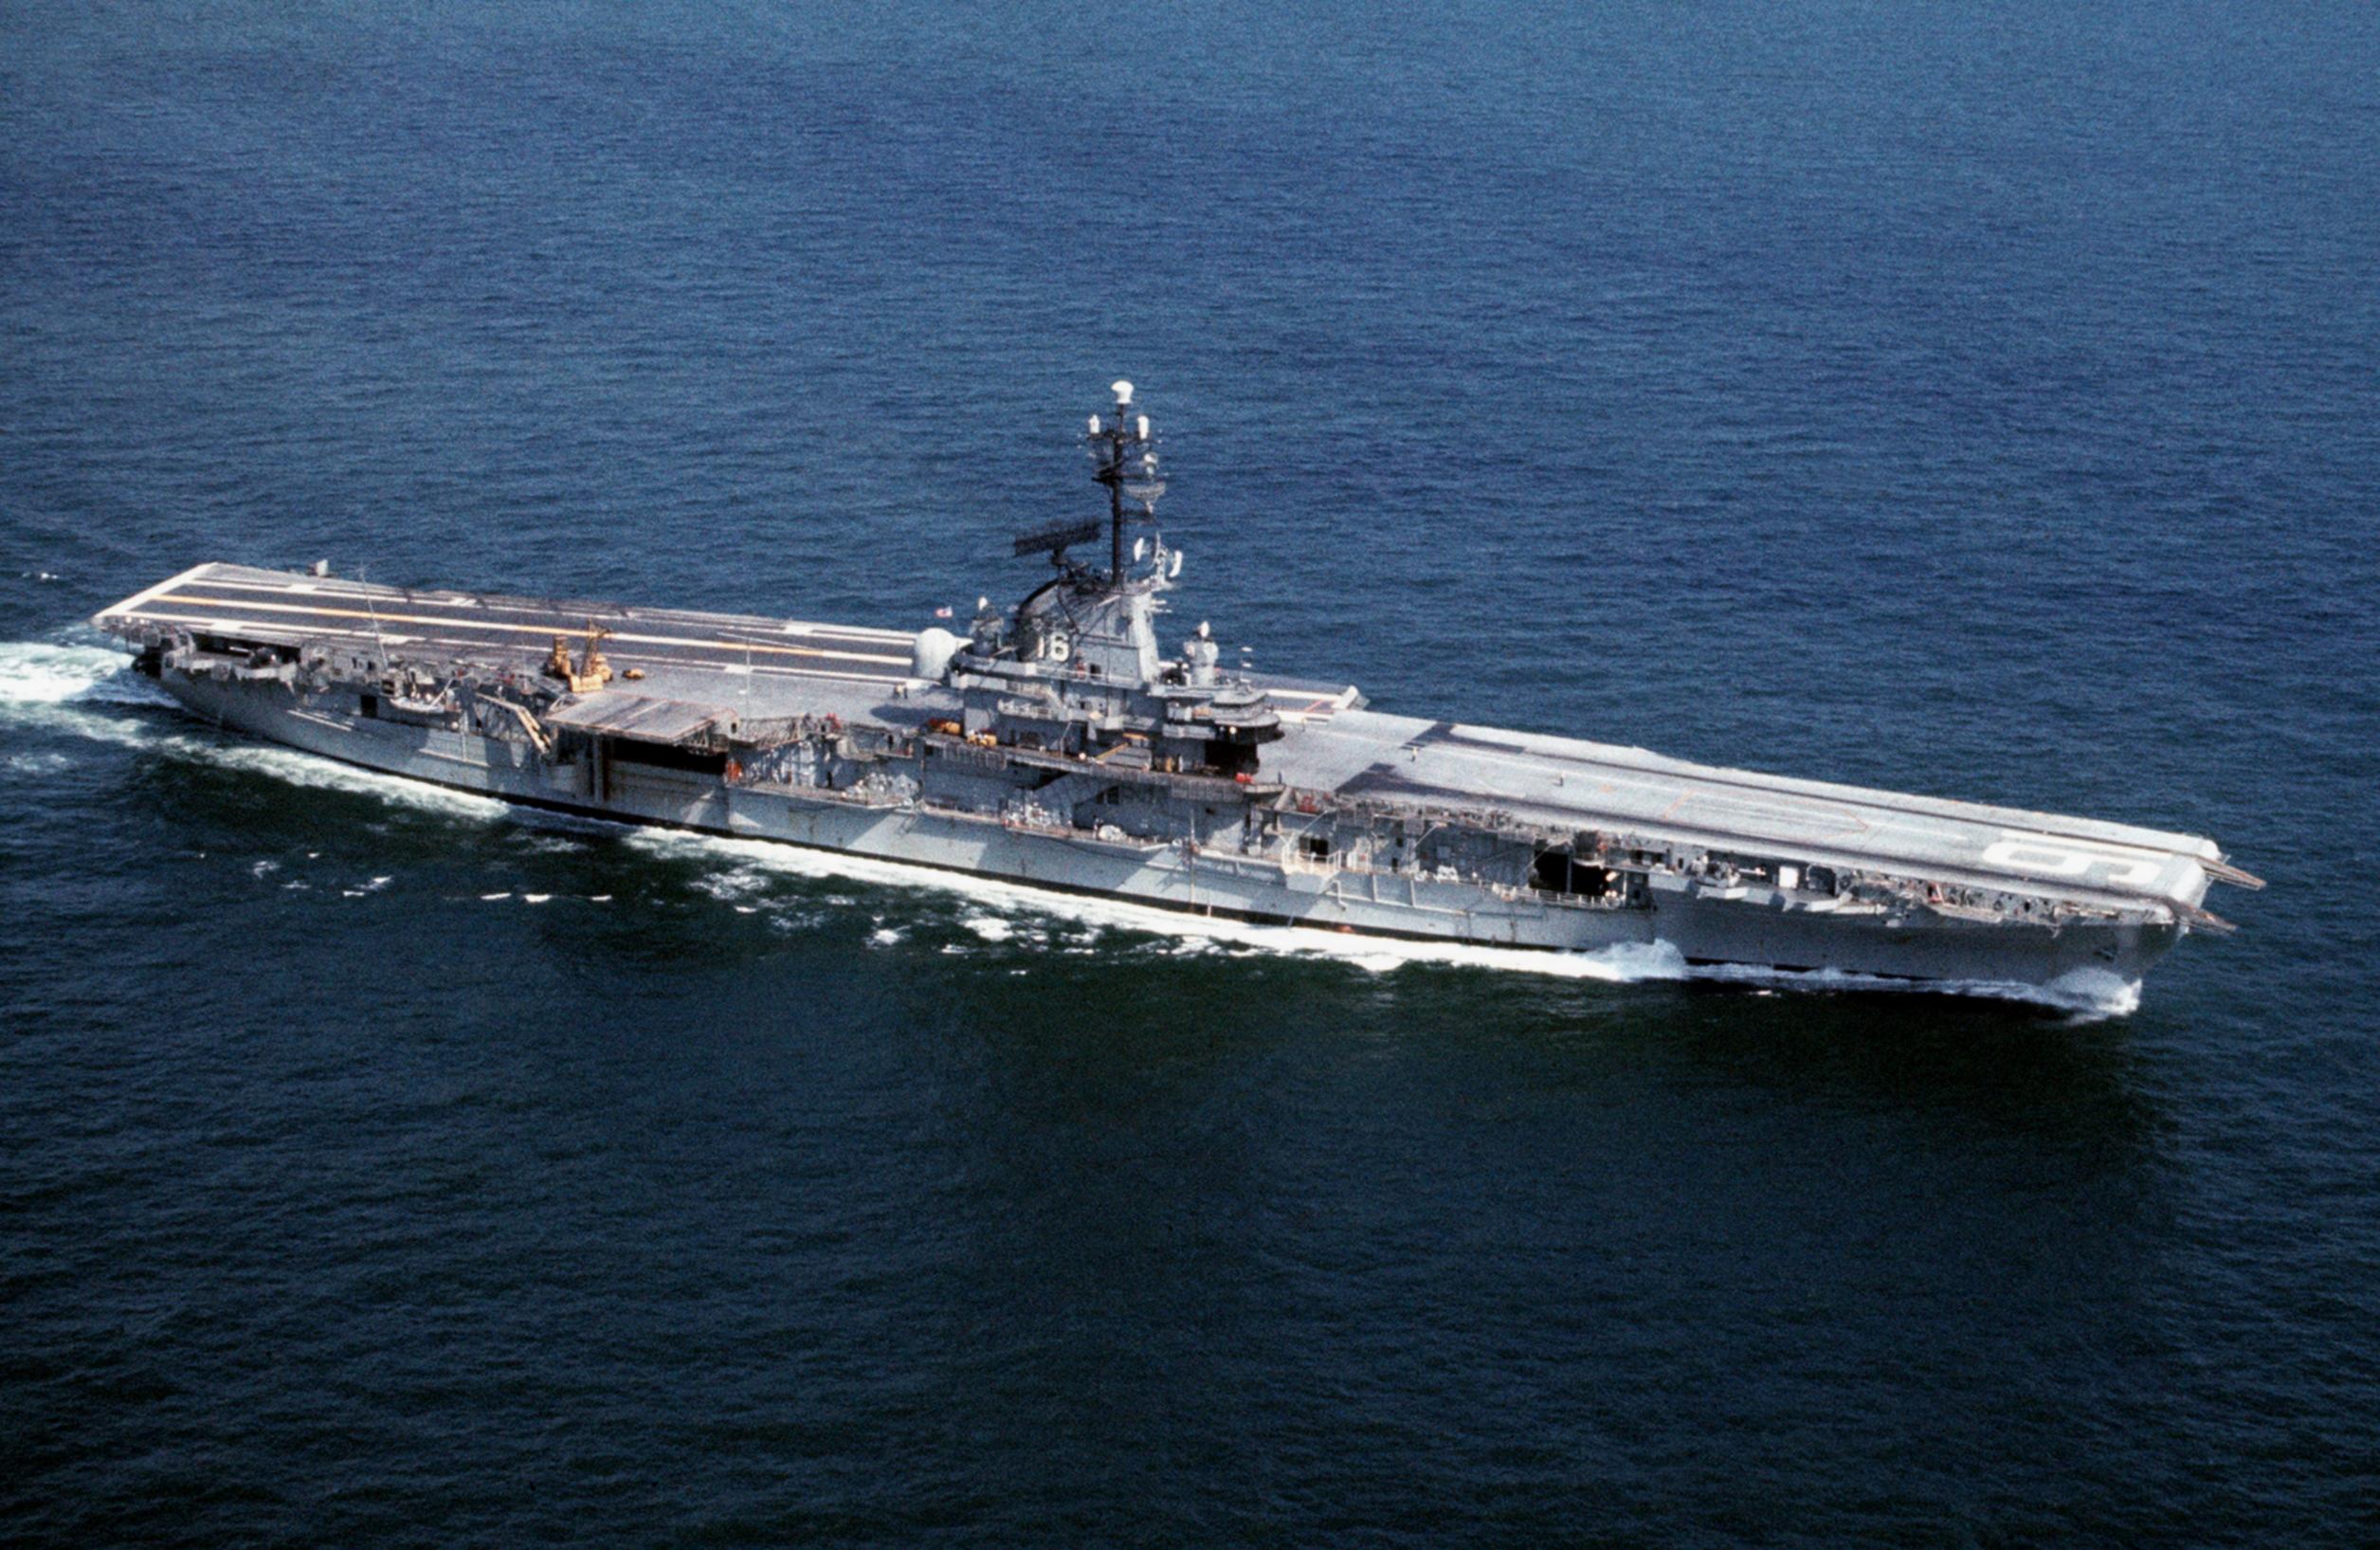 6 Sizes! AVT 16 New Photo: USS LEXINGTON Carrier Docked at Naval Air Station